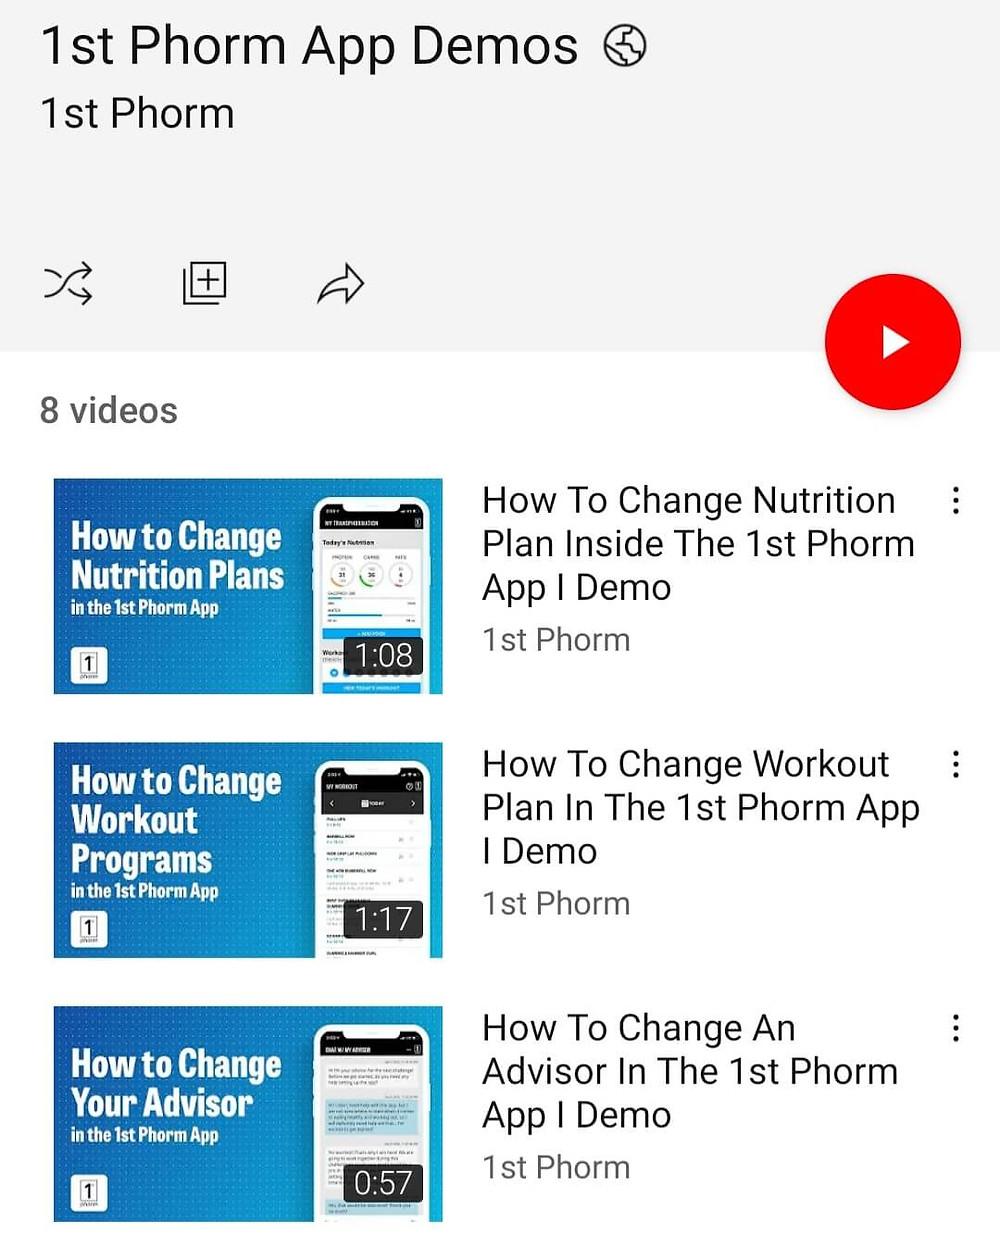 1st Phorm App Demo Tutorial YouTube Playlist